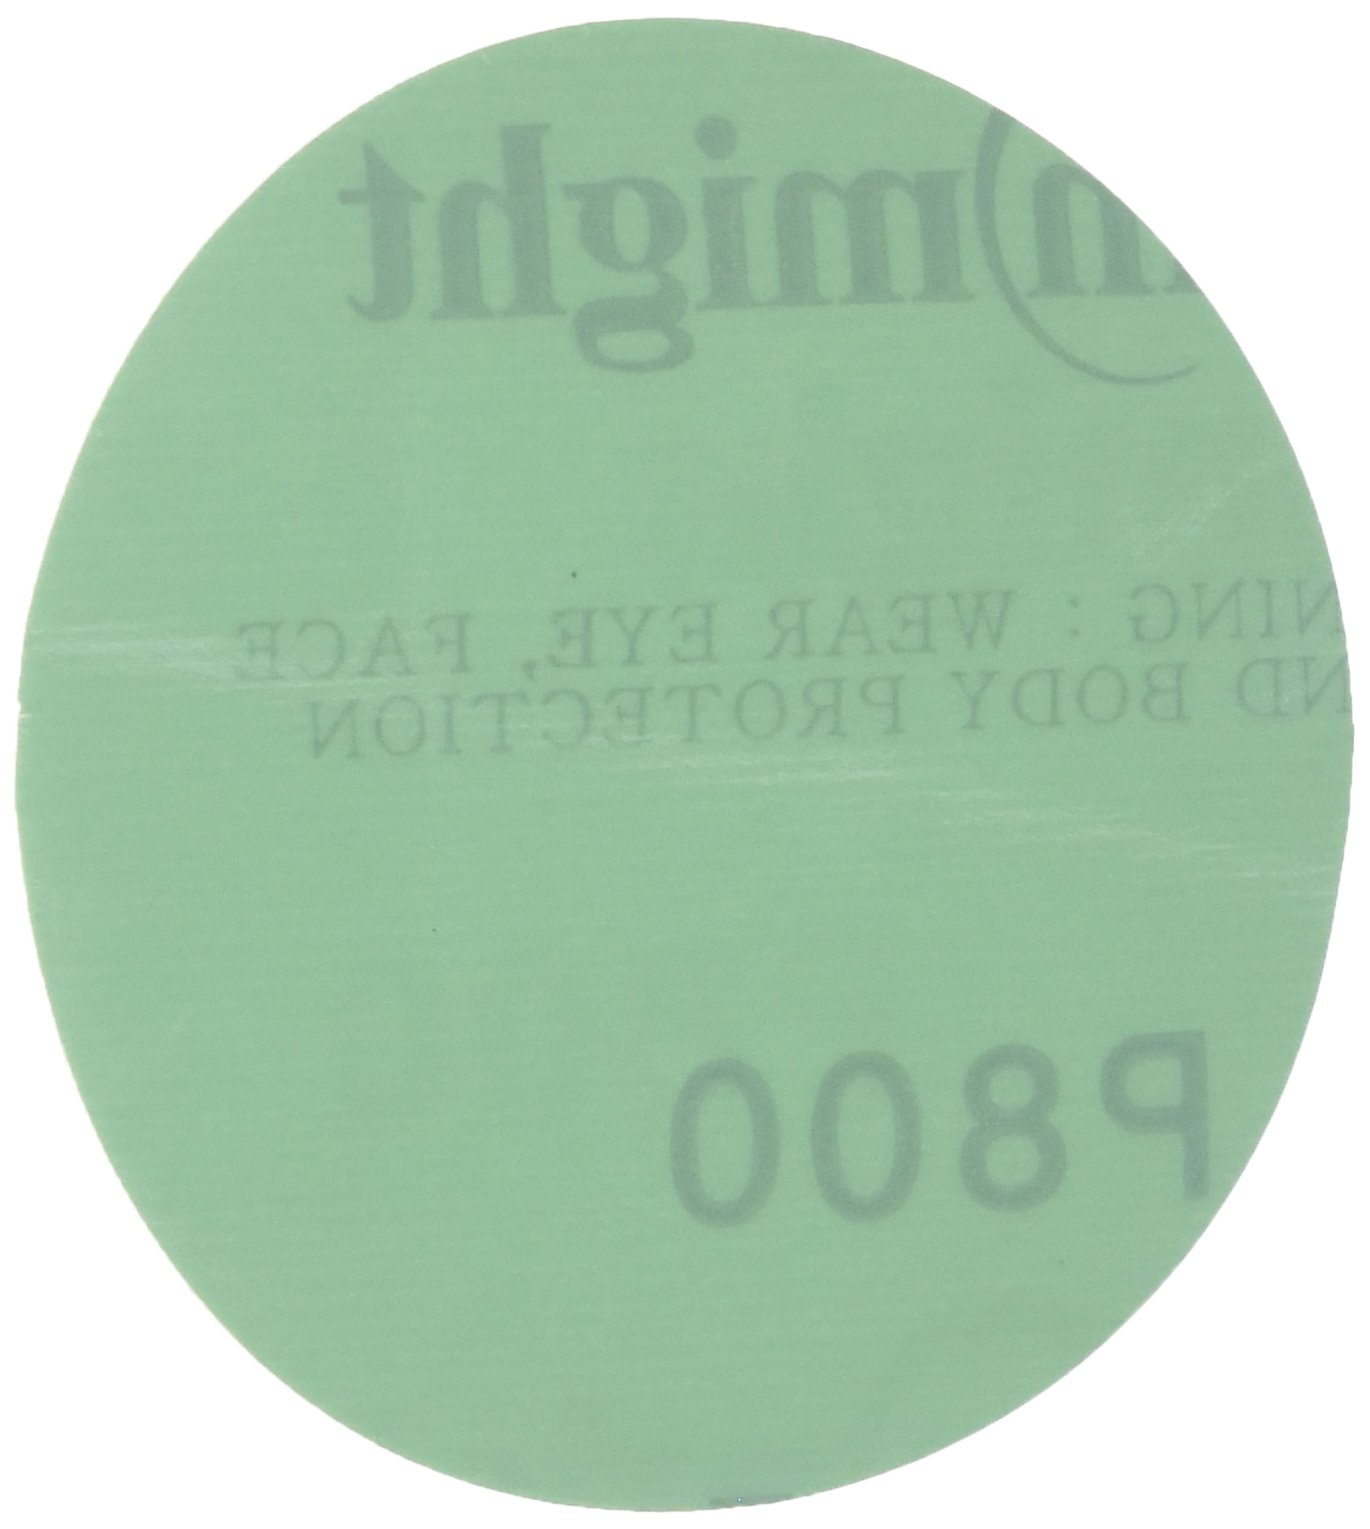 Sunmight 54219 3'' No Hole Velcro Disc (Film Grit 800)